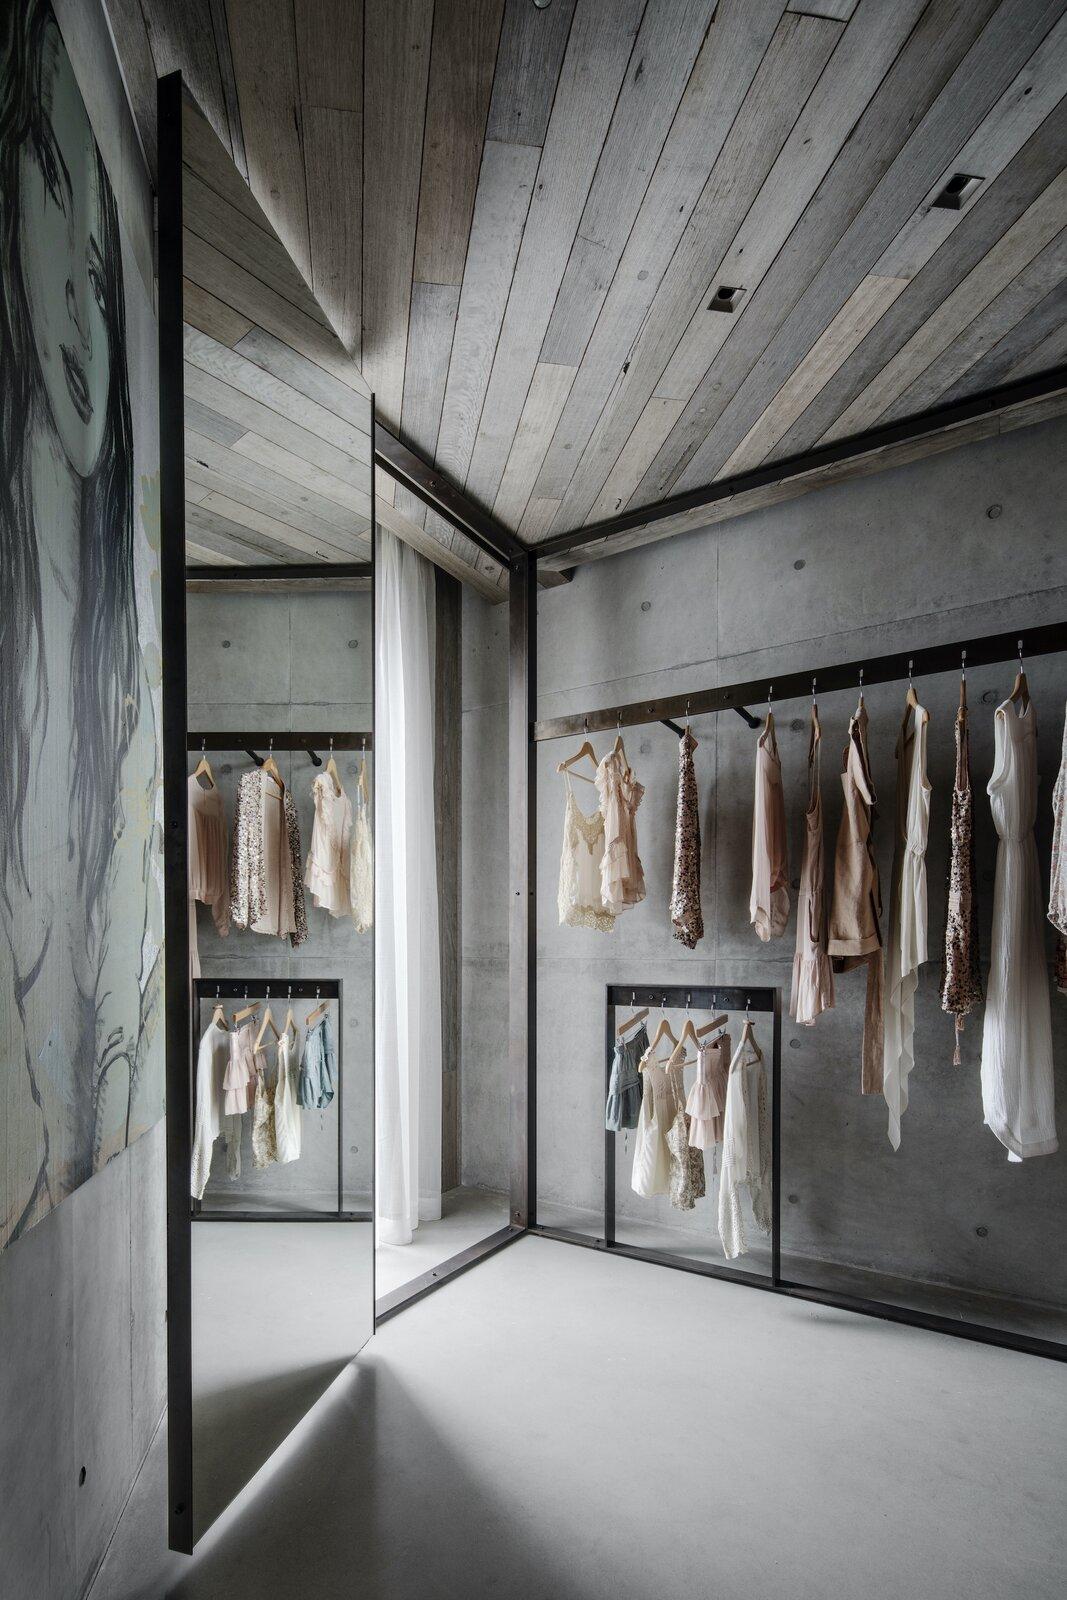 Wardrobe of Silver Linings by Rachcoff Vella Architects.